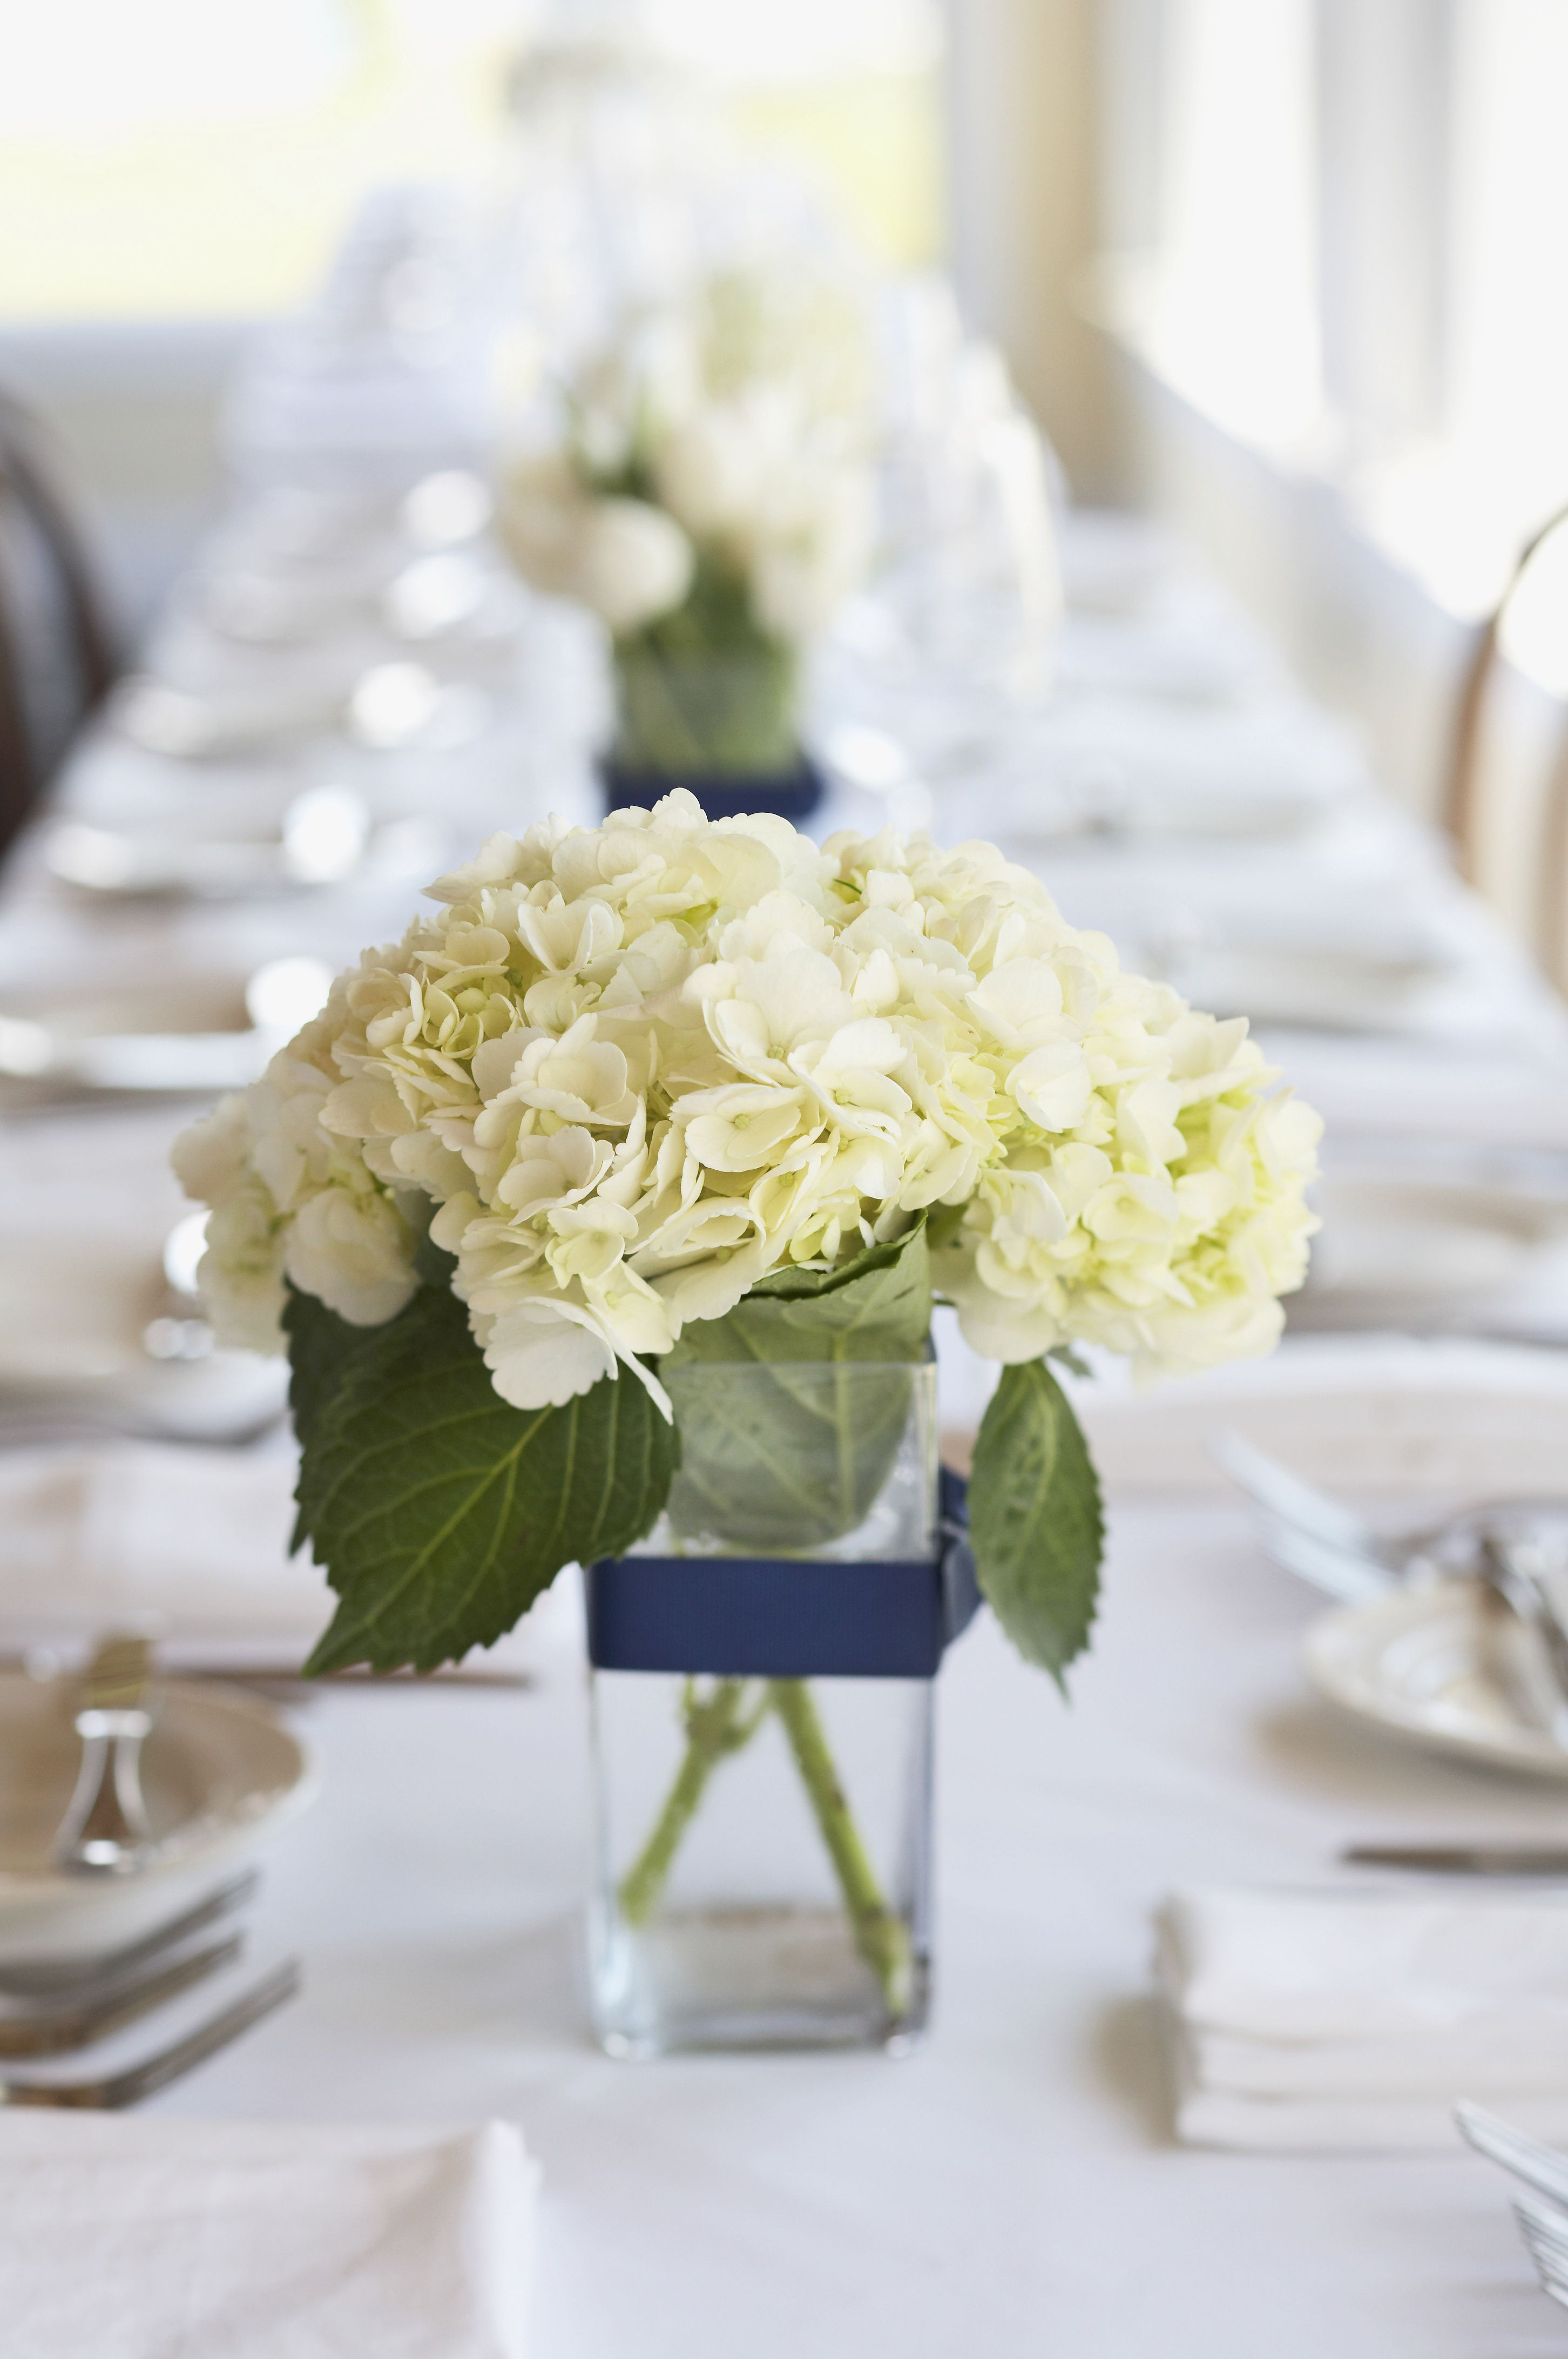 shorter arrangement for the tables | For The Table | Pinterest ...